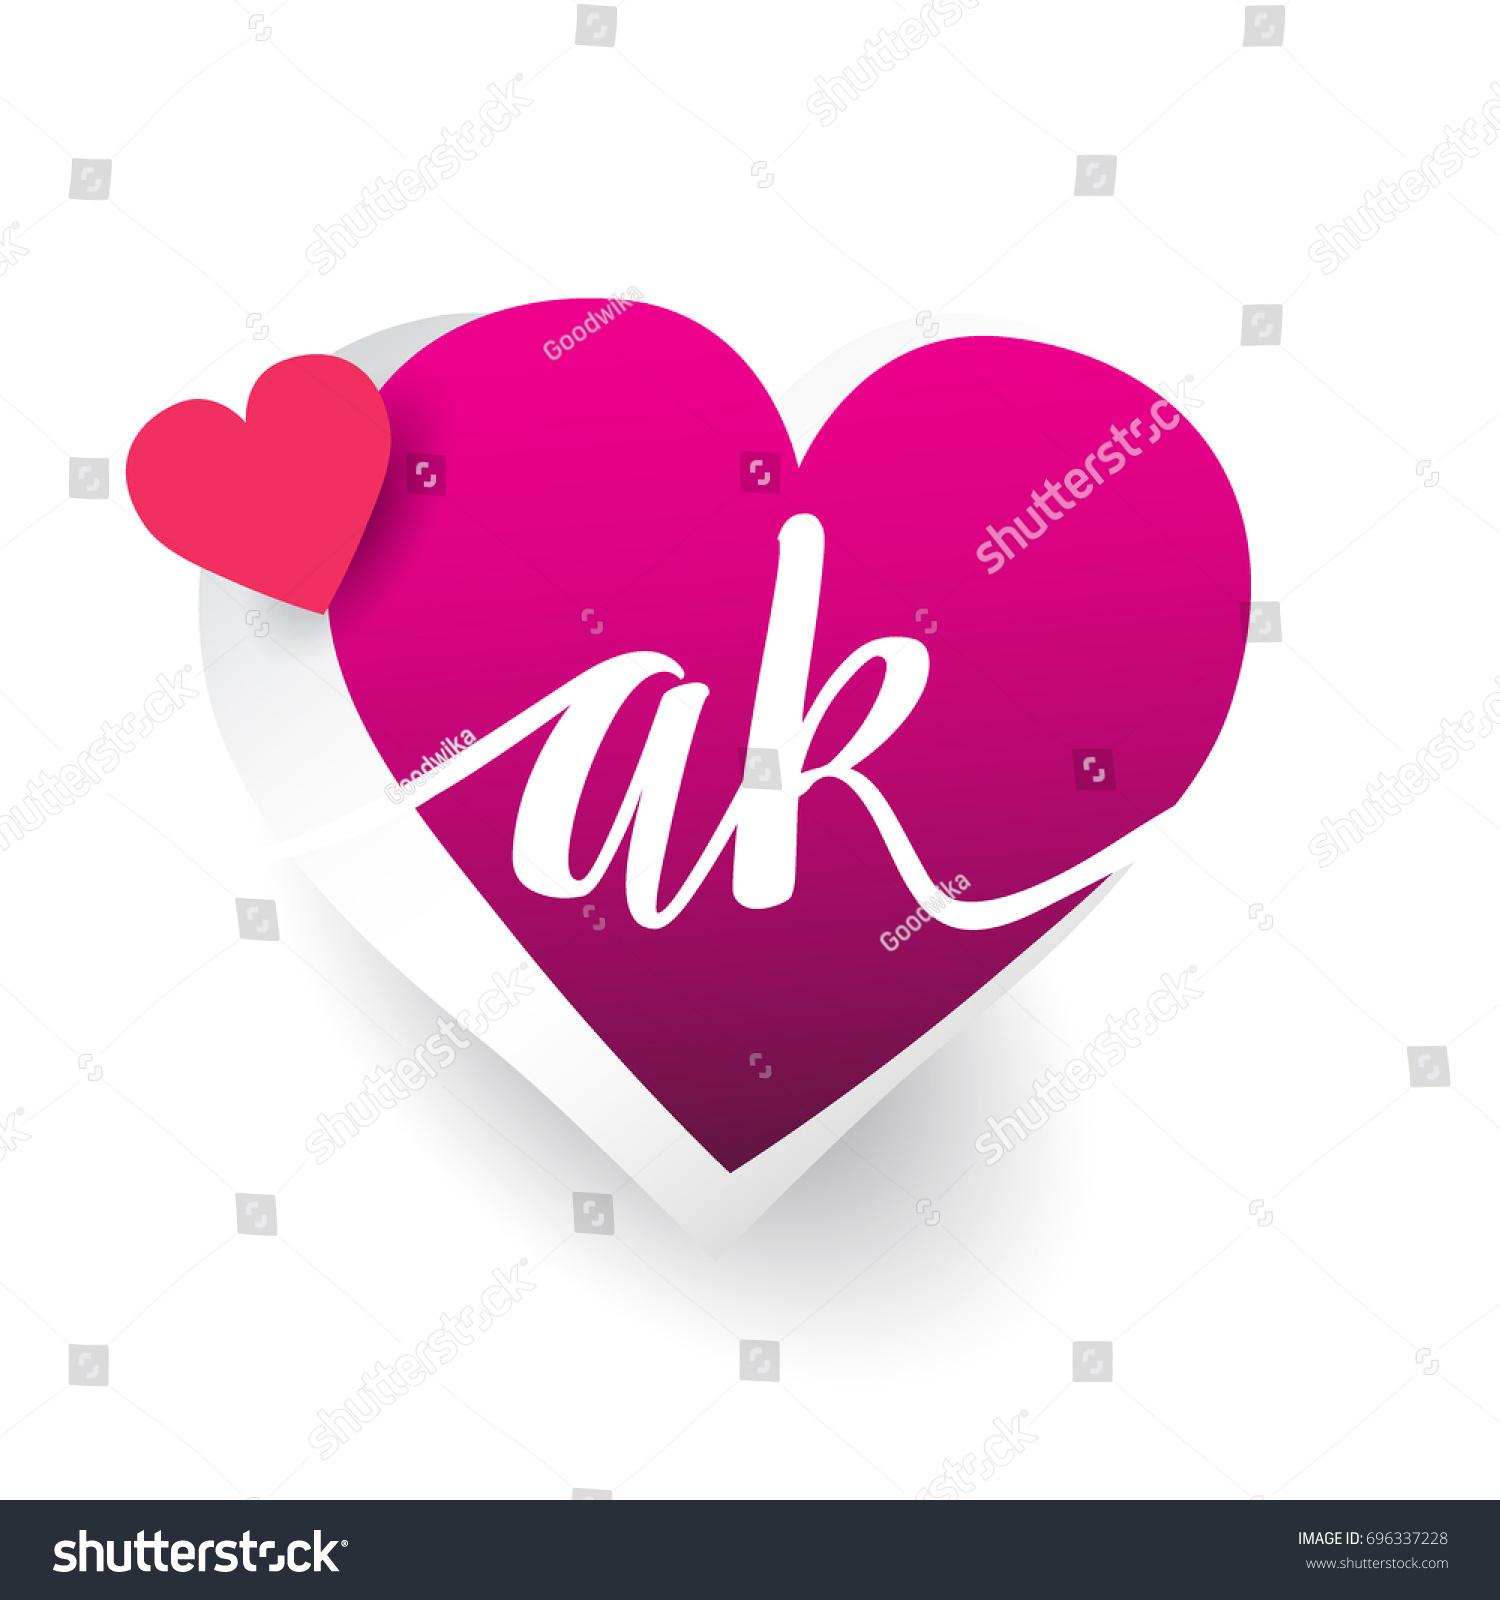 initial logo letter ak heart shape stock vector royalty free 696337228 https www shutterstock com image vector initial logo letter ak heart shape 696337228